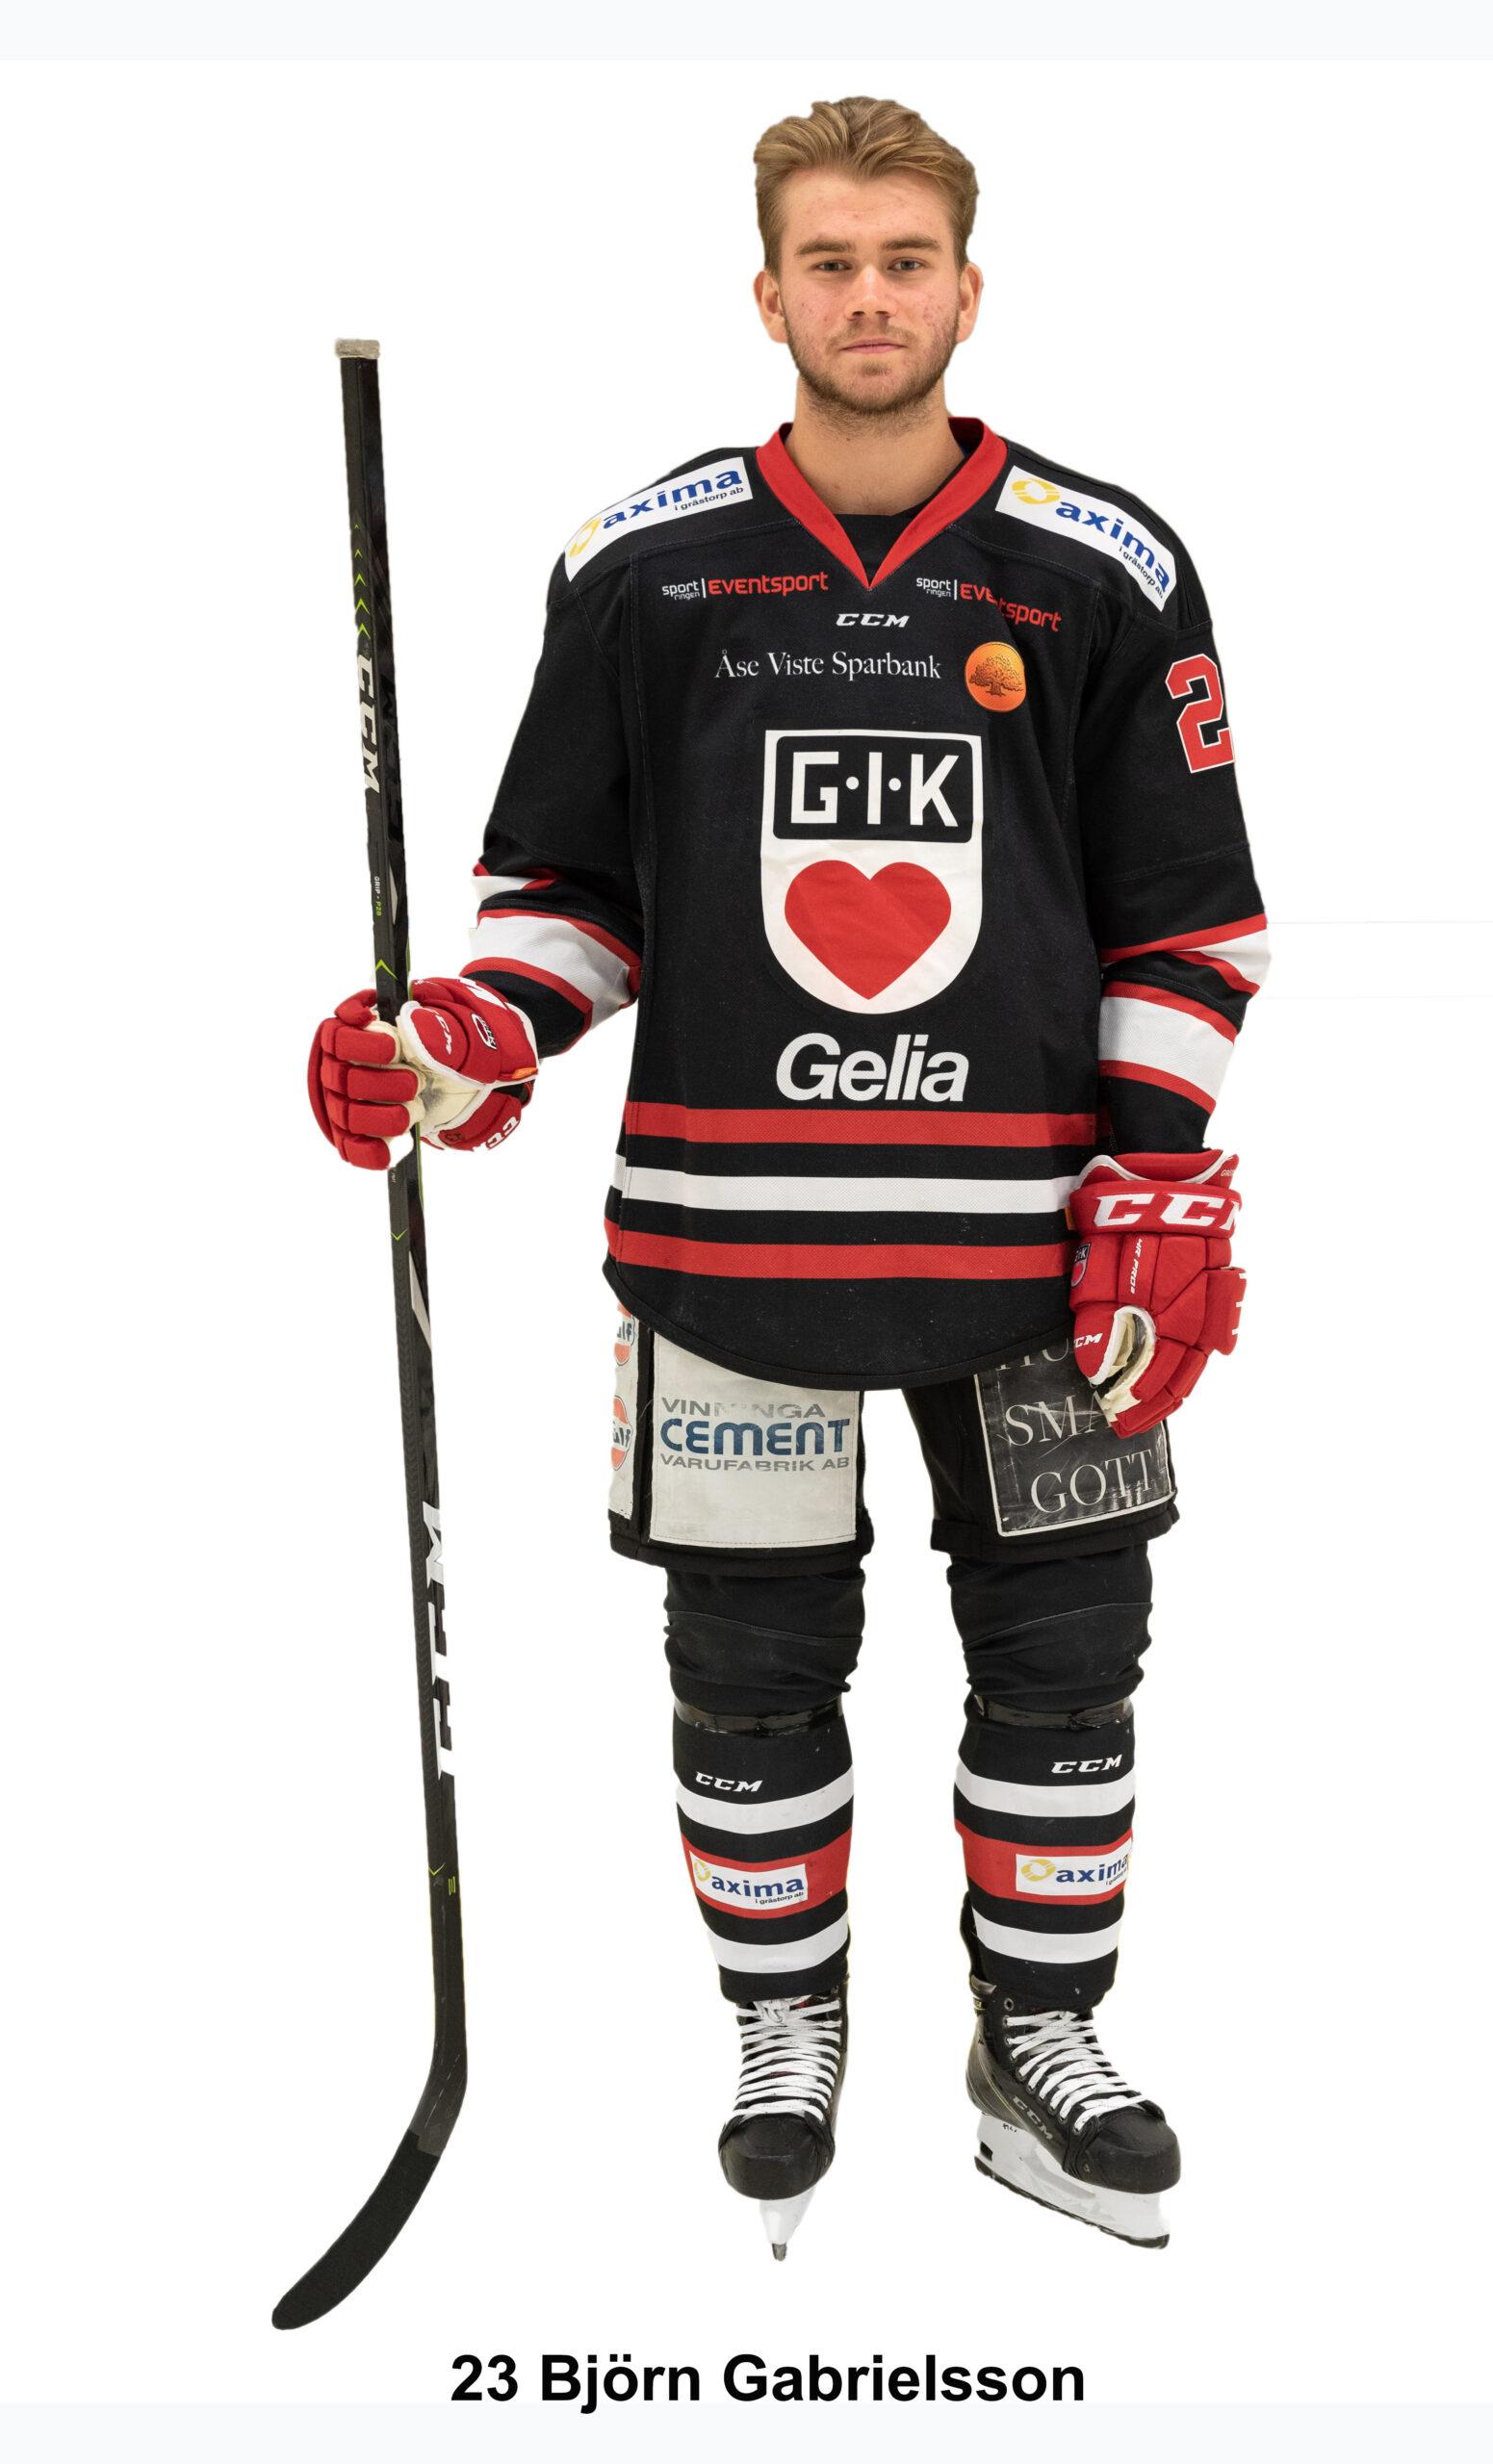 Björn Gabrielsson